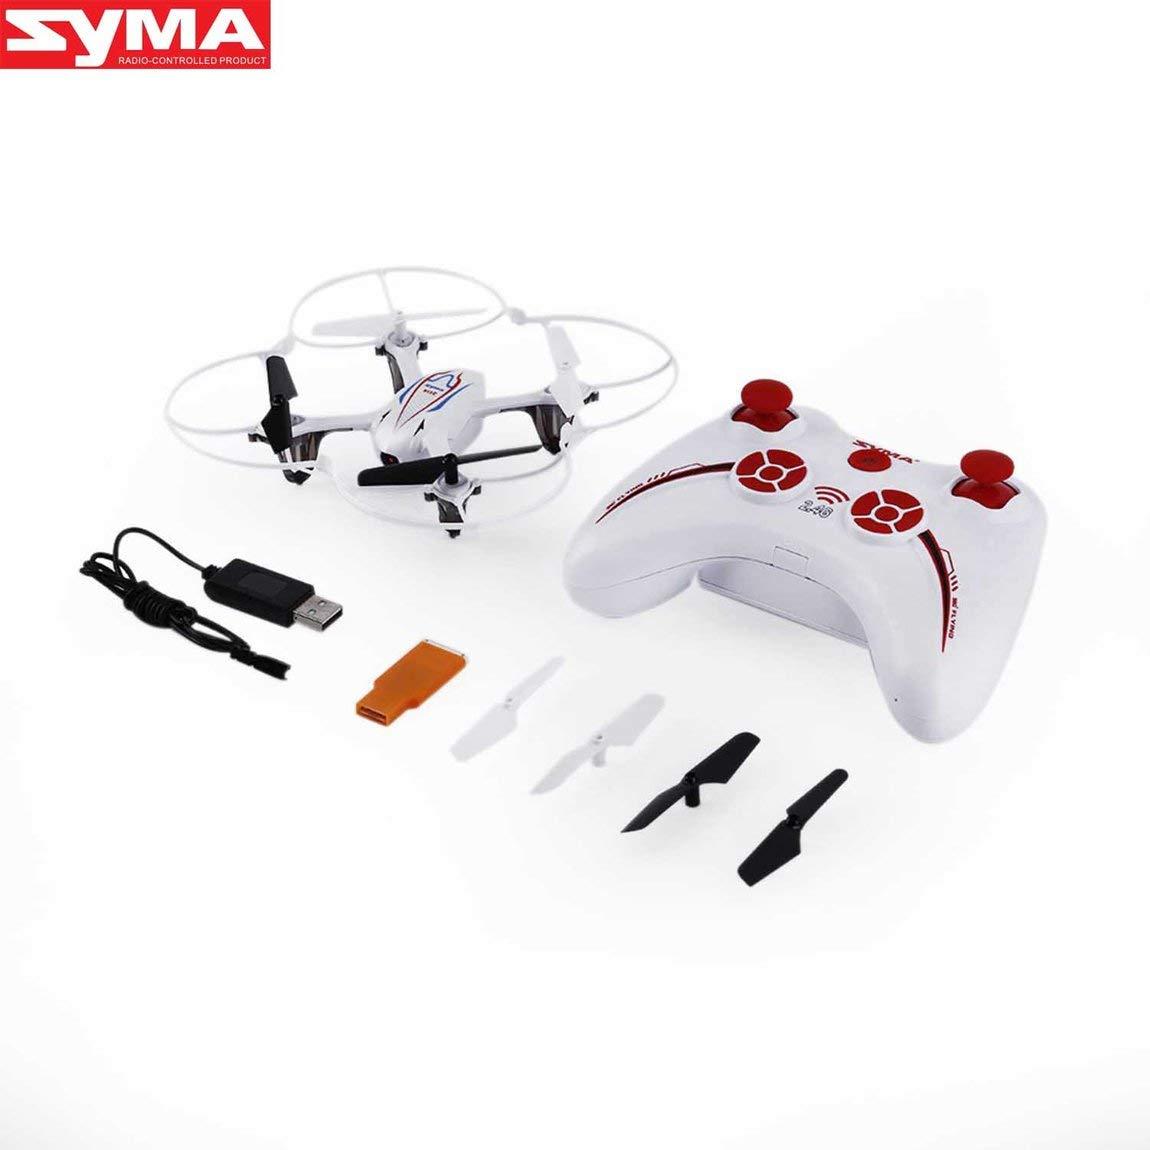 HarveyRudol85 [Excelente] blanc 2.4G 4CH 6 Axis RC Quadcopter with HD 2.0MP Camera for SYMA X11C